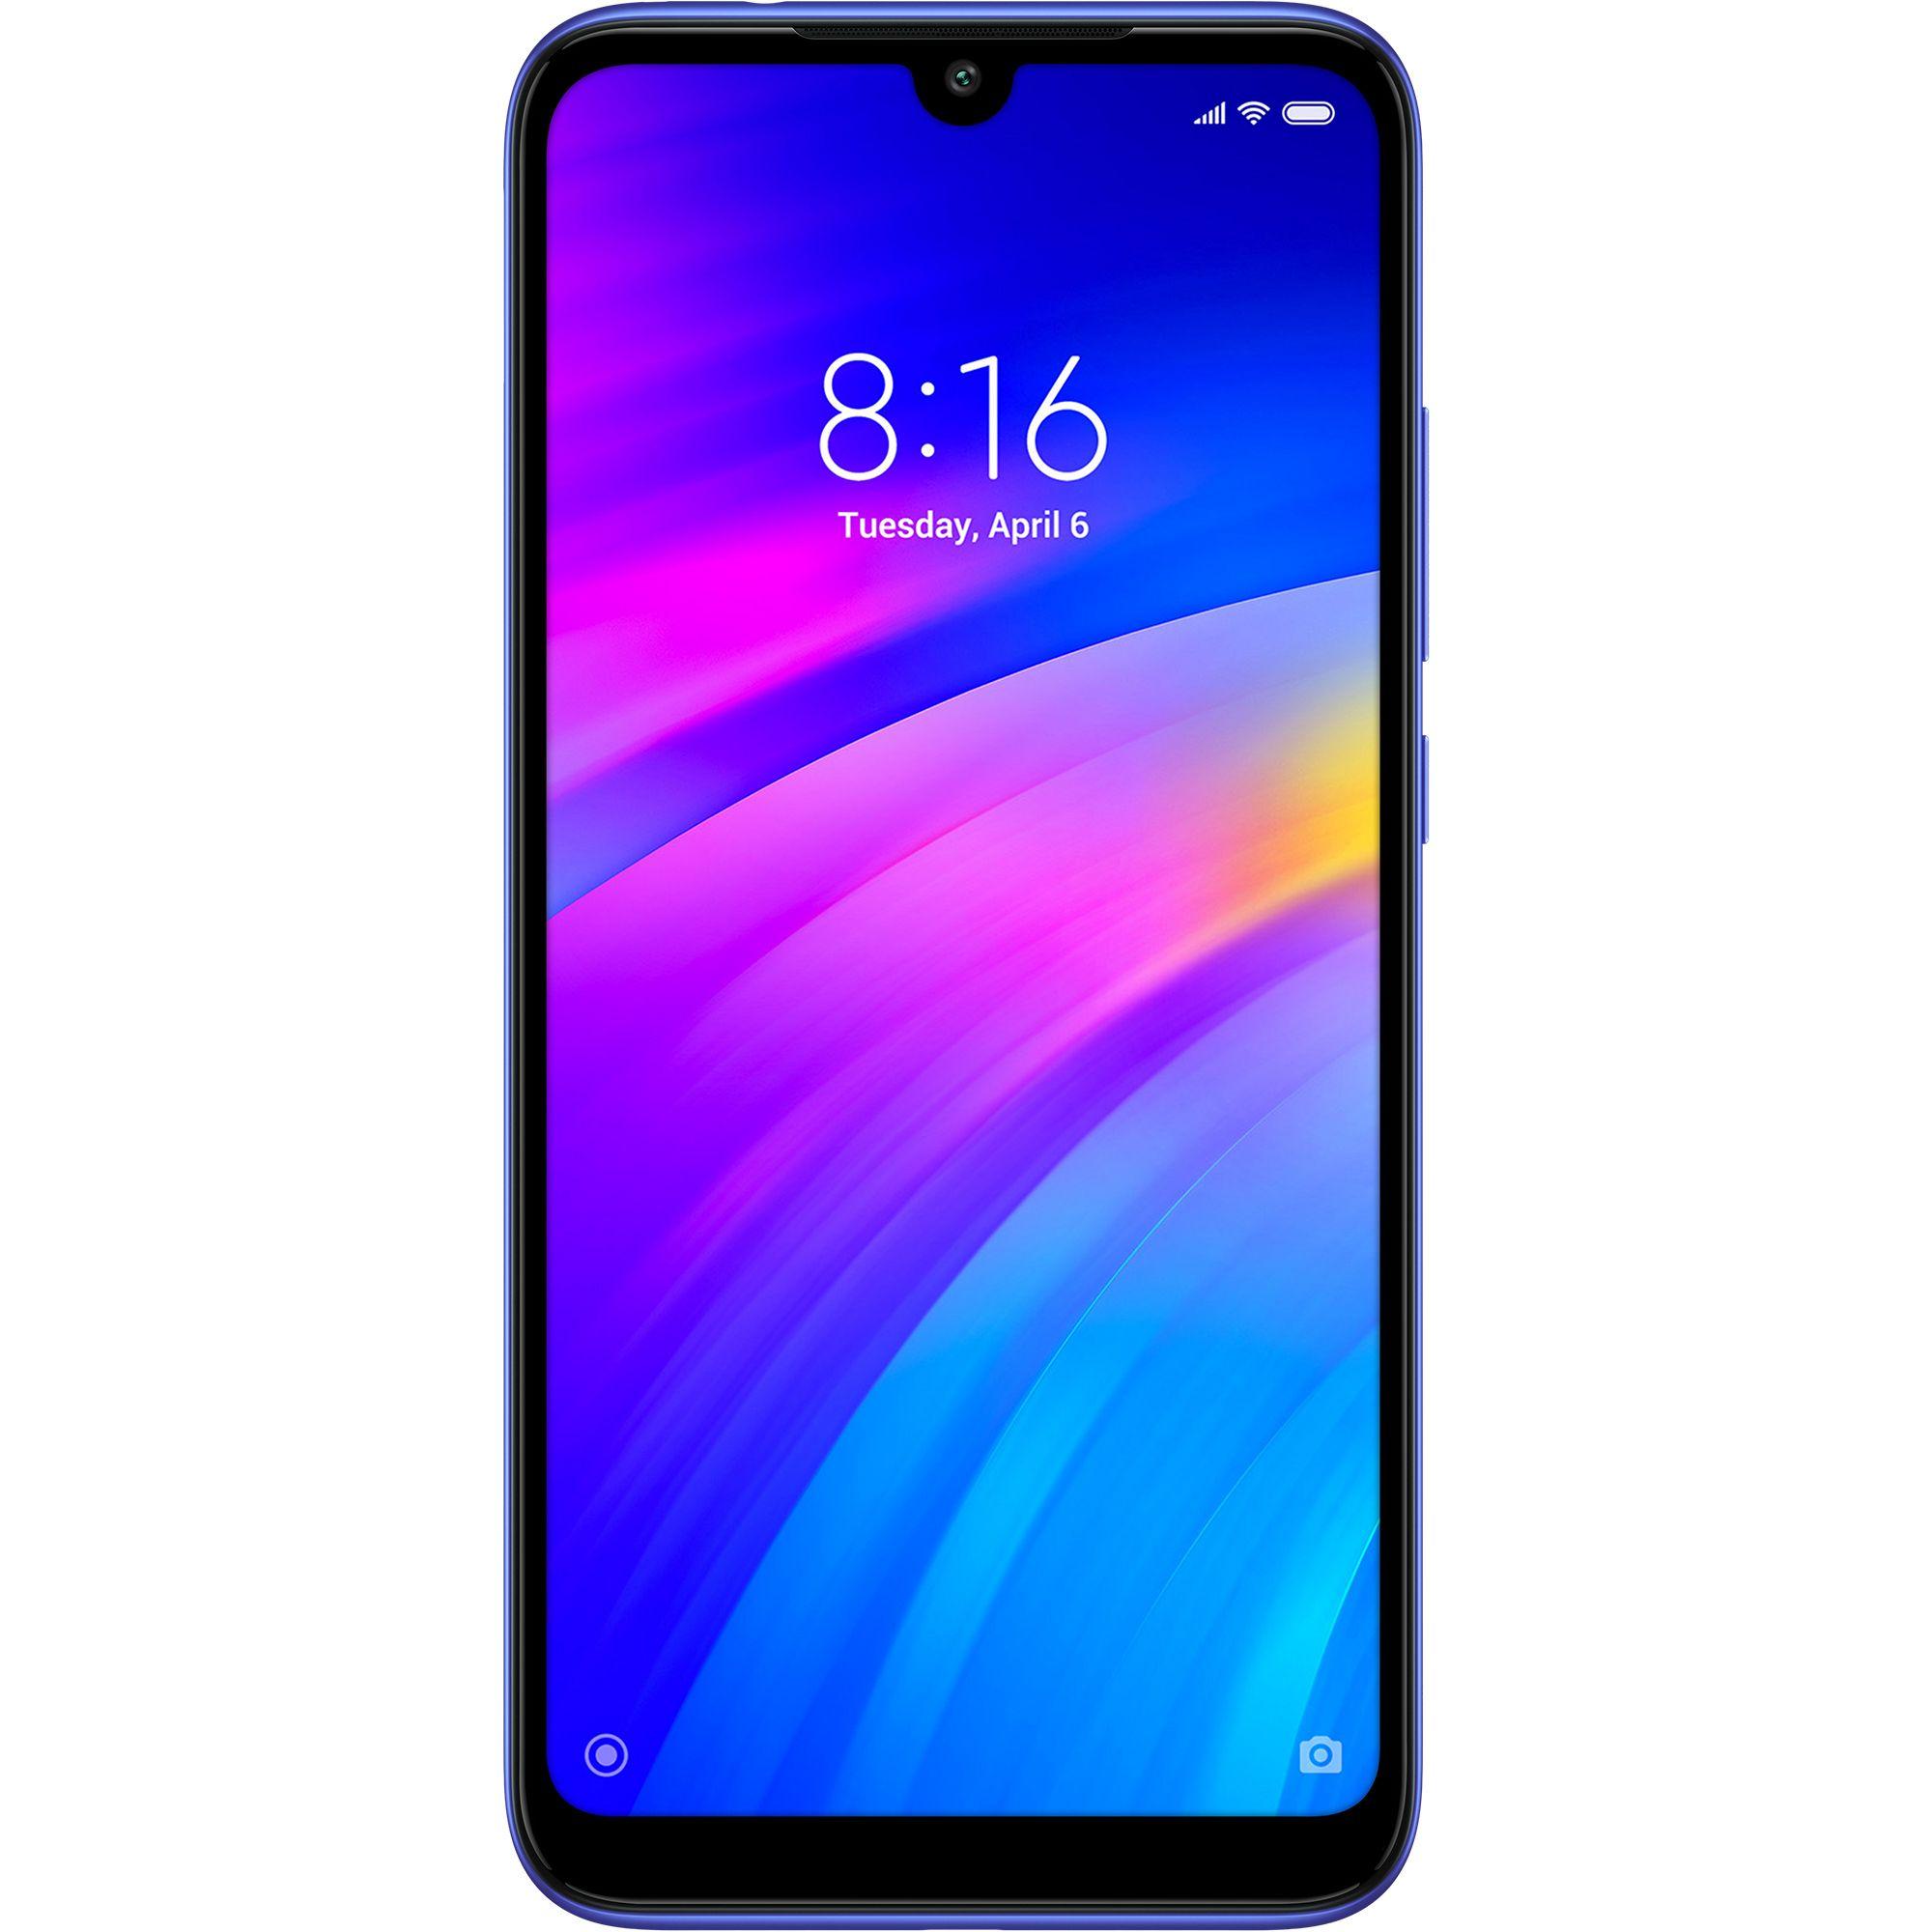 Telefon Mobil Xiaomi Redmi 7, Dual Sim, 16GB, 2GB RAM, 4G, Blue